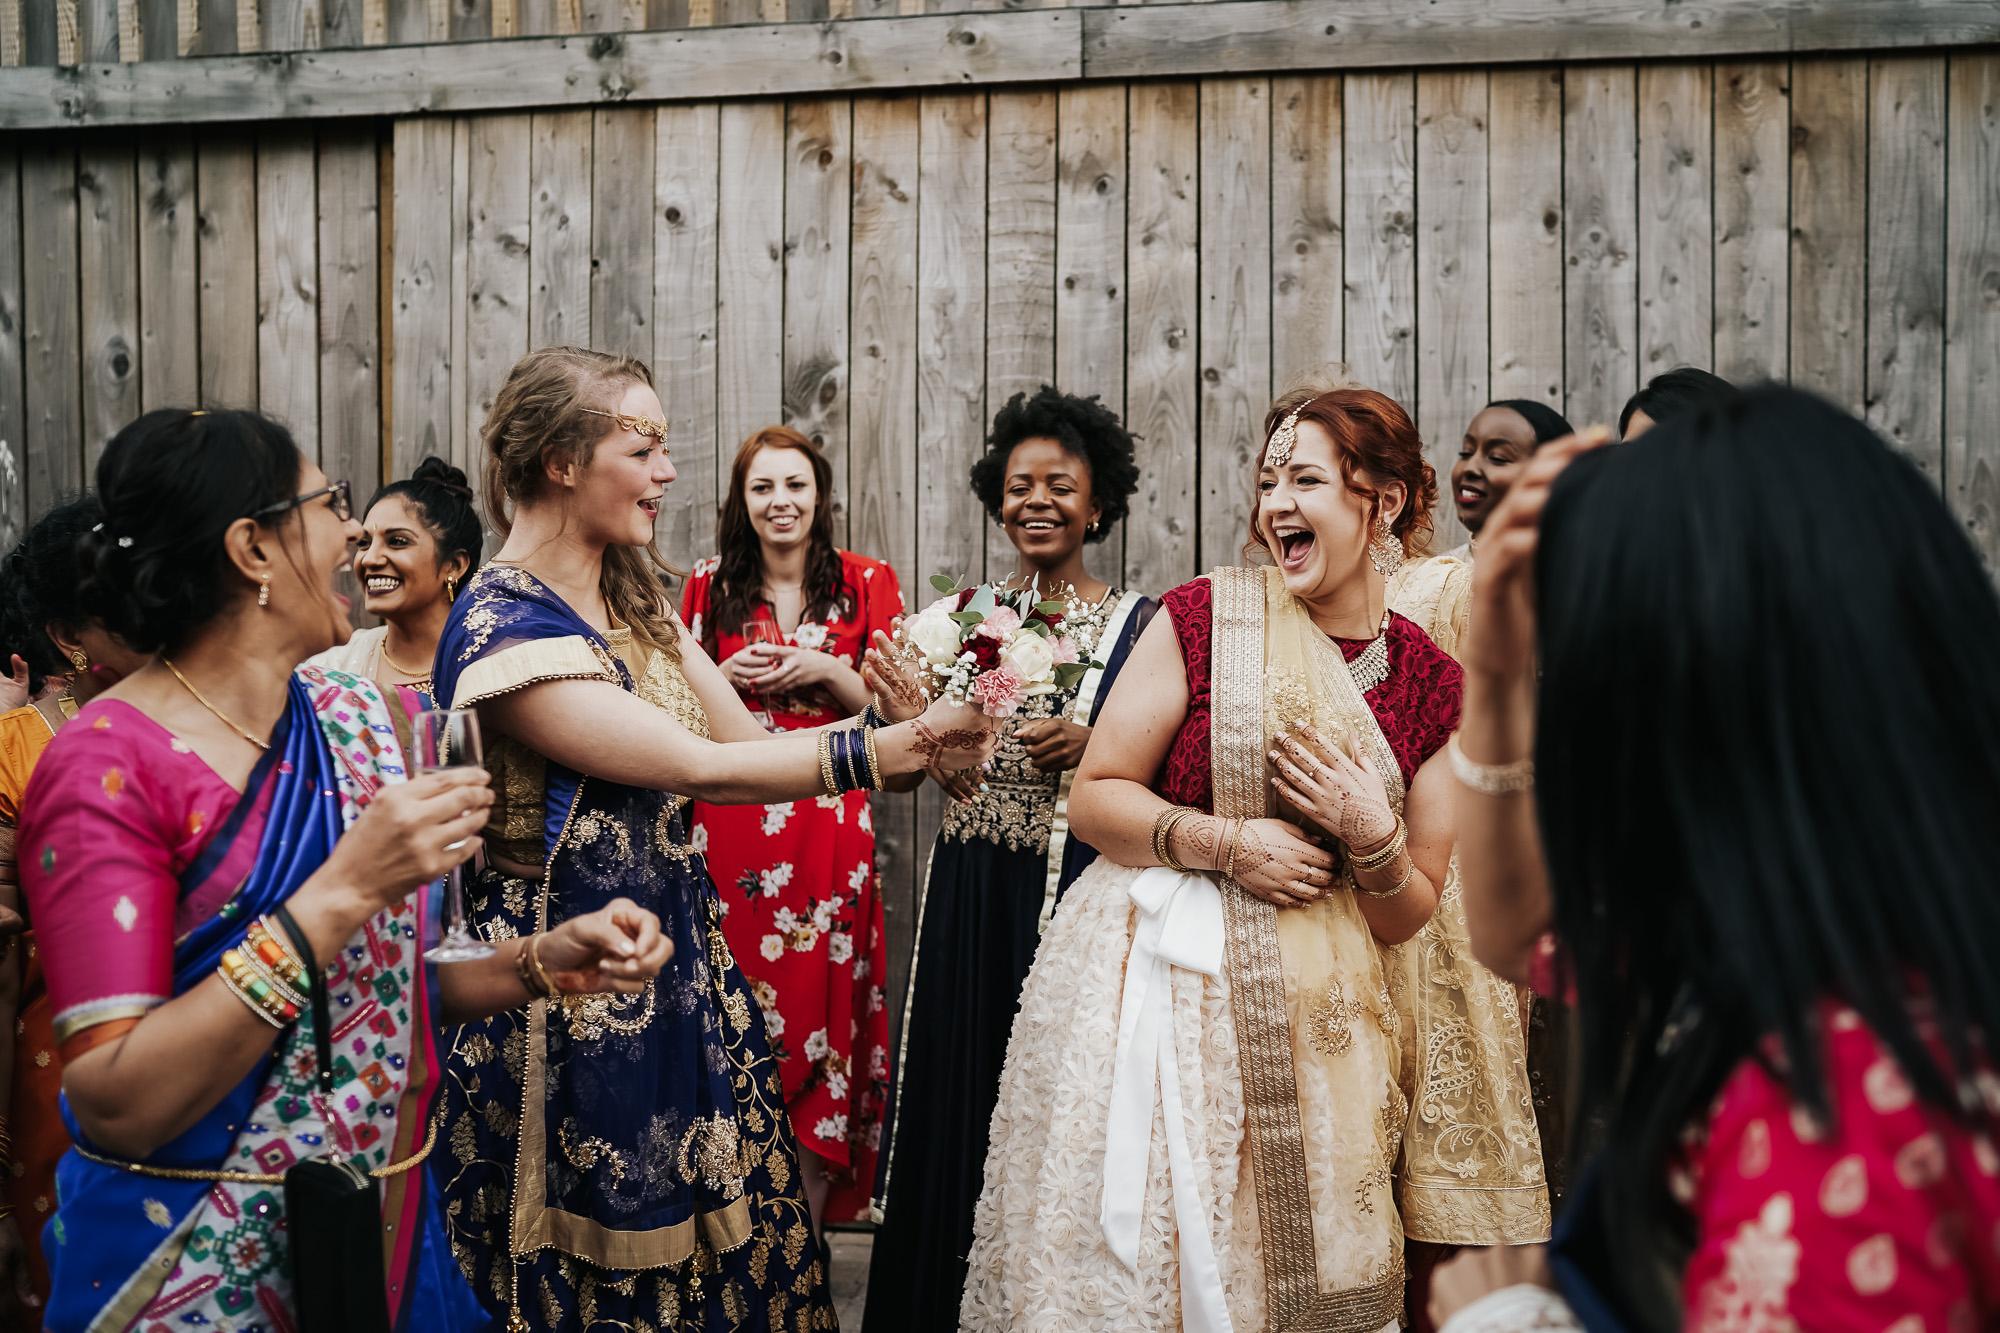 Alcumlow Hall Farm Indian Wedding Photographer (30 of 44).jpg